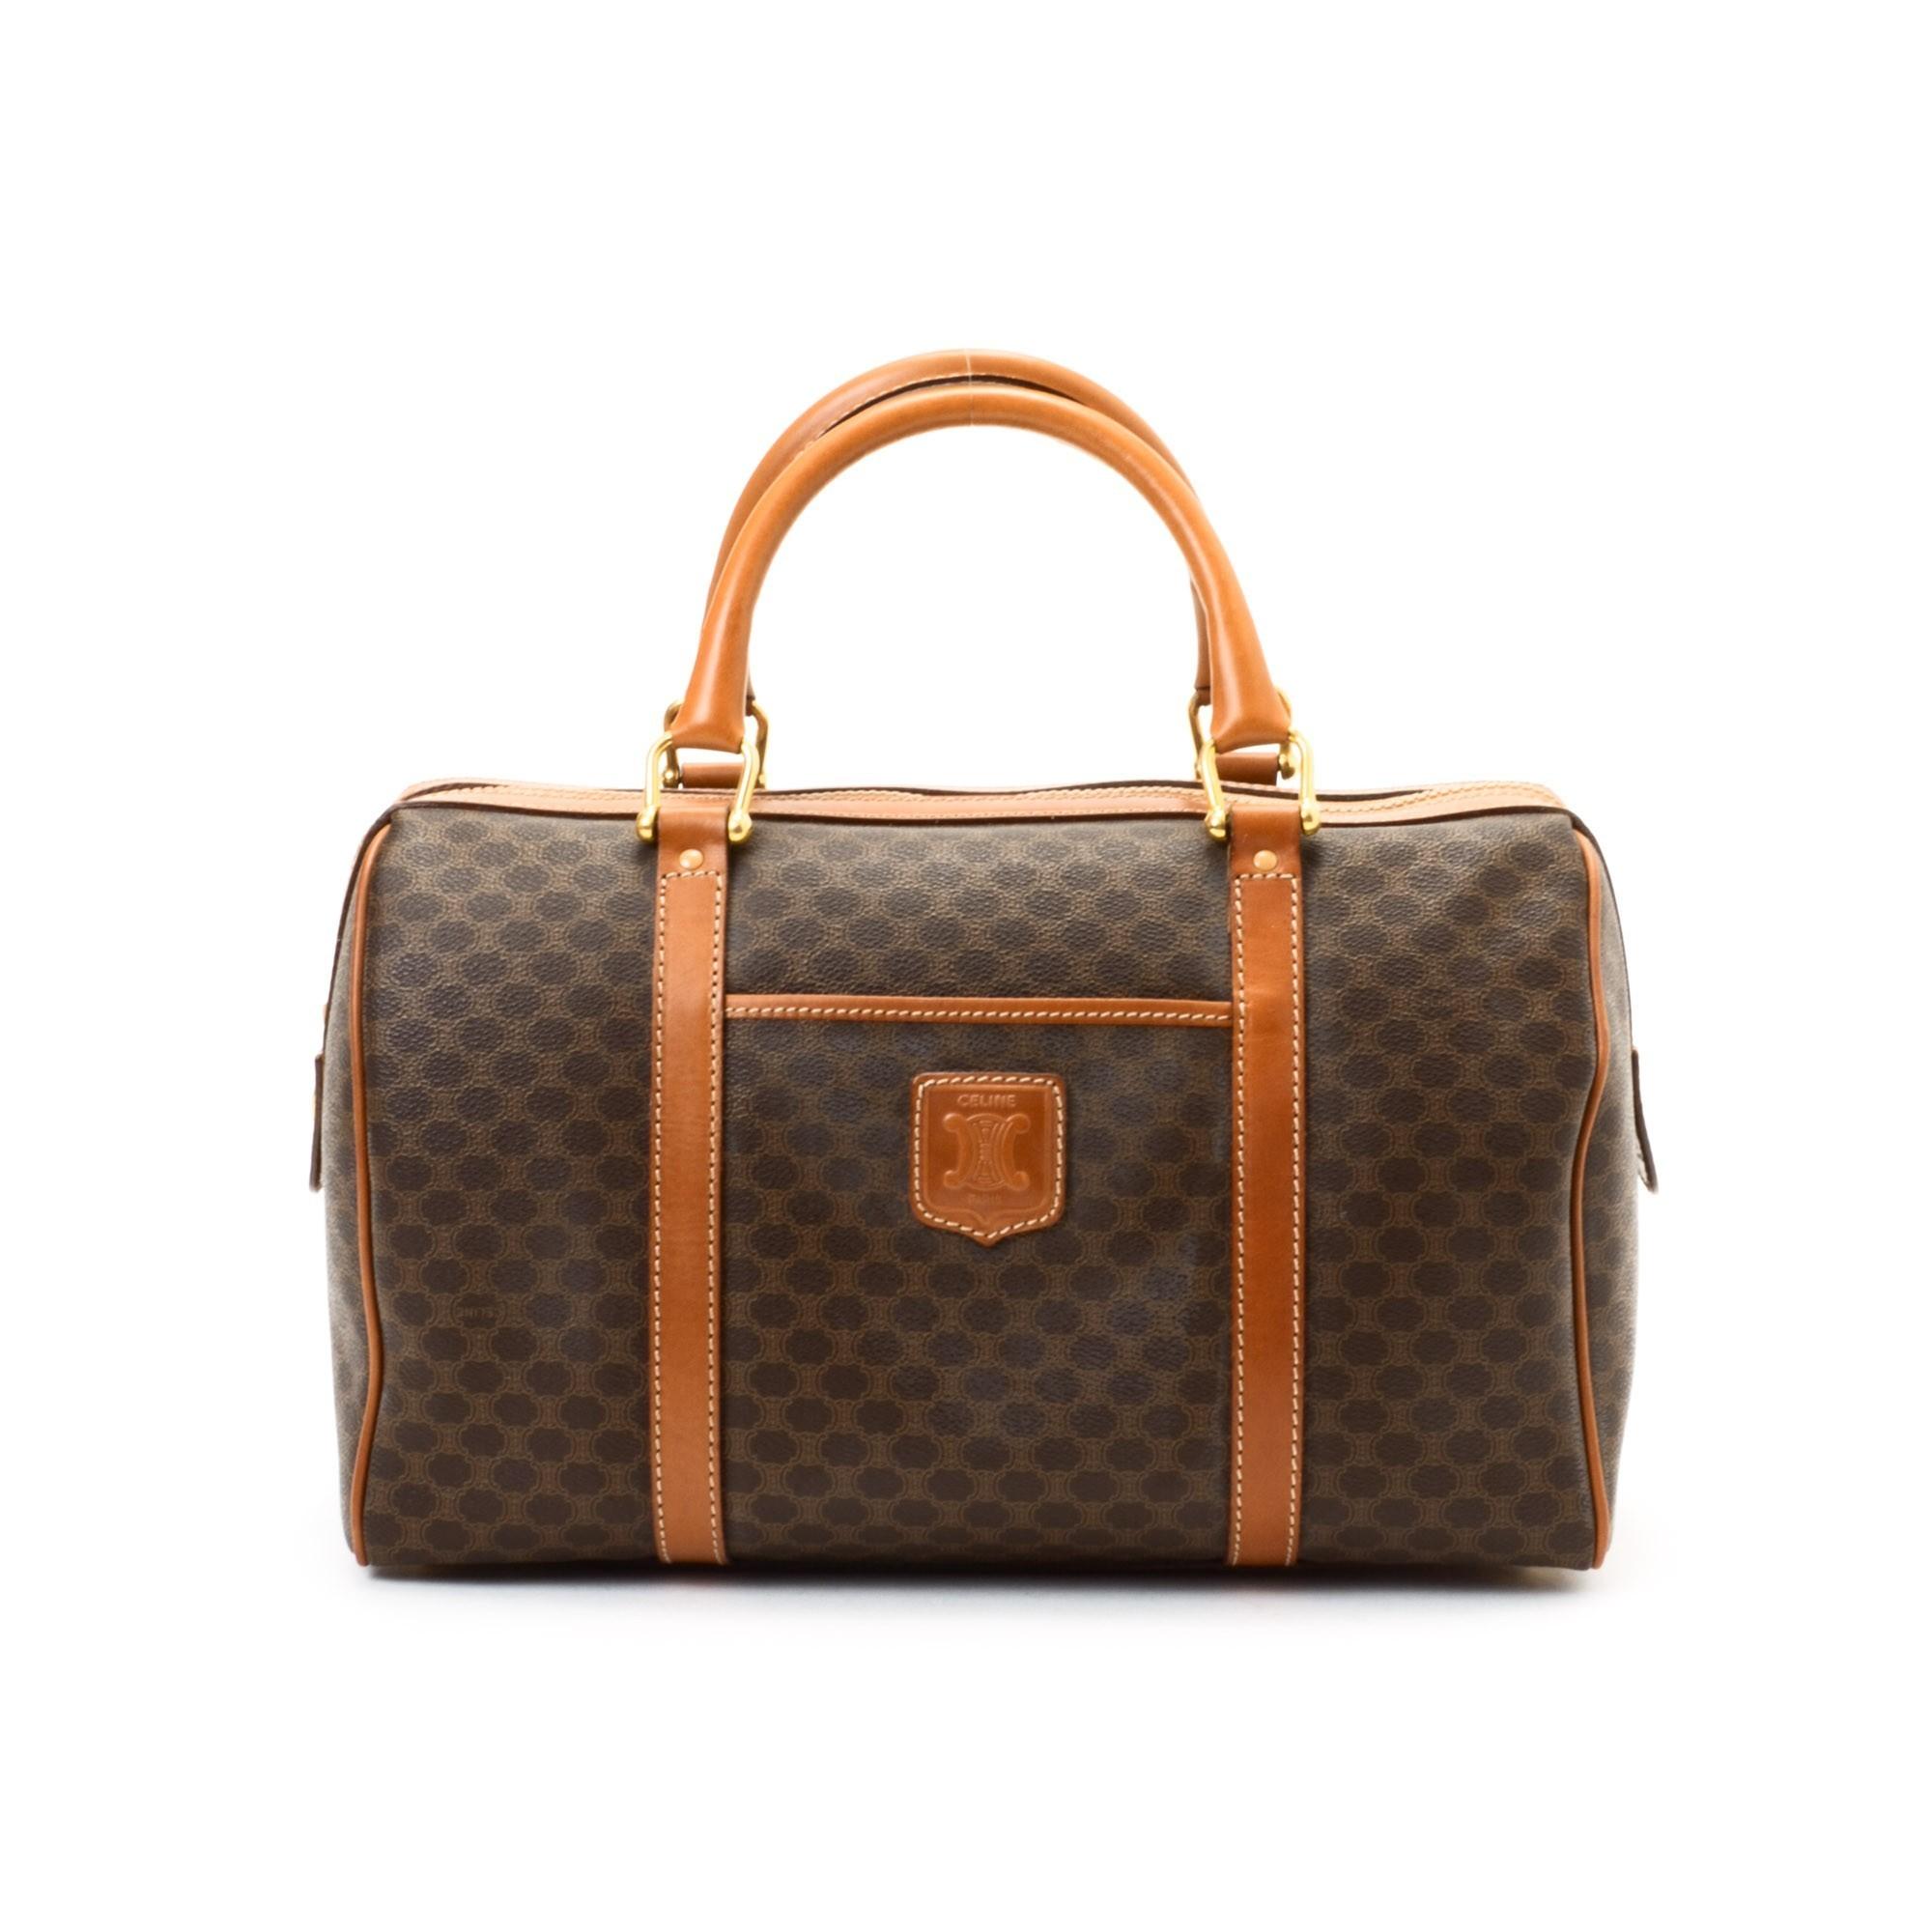 C¨¦LINE Boston Bag Macadam Brown Coated Canvas Travel Bag - LXR\u0026amp;CO ...